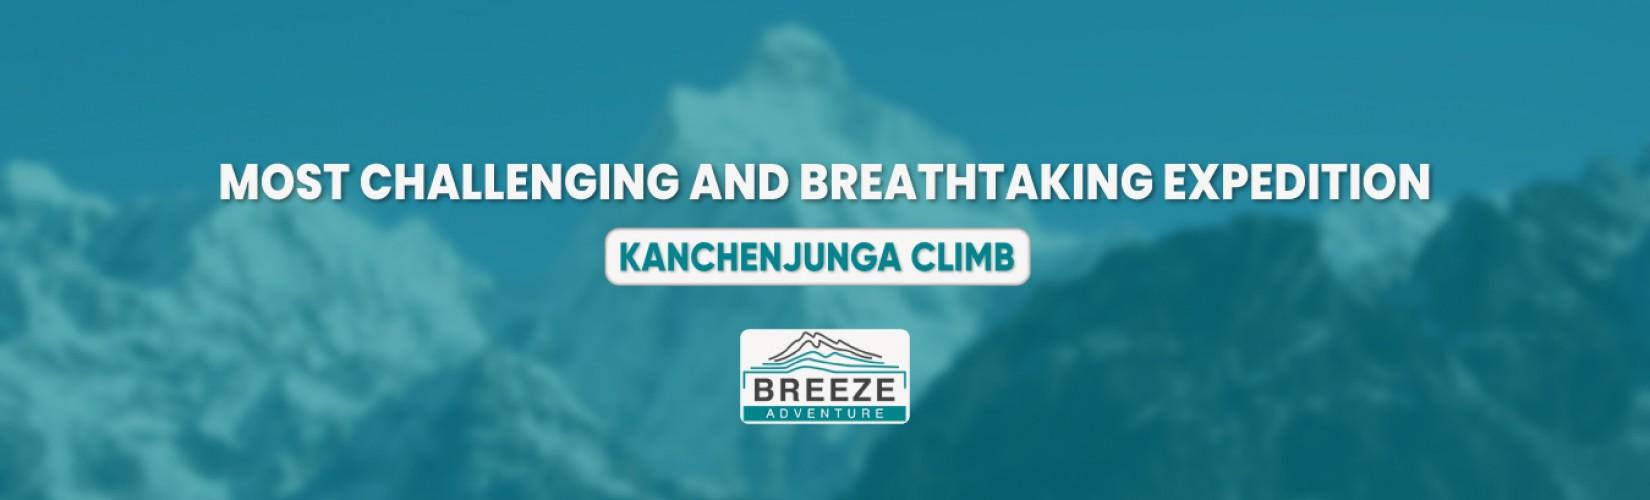 Kanchenjunga Climb